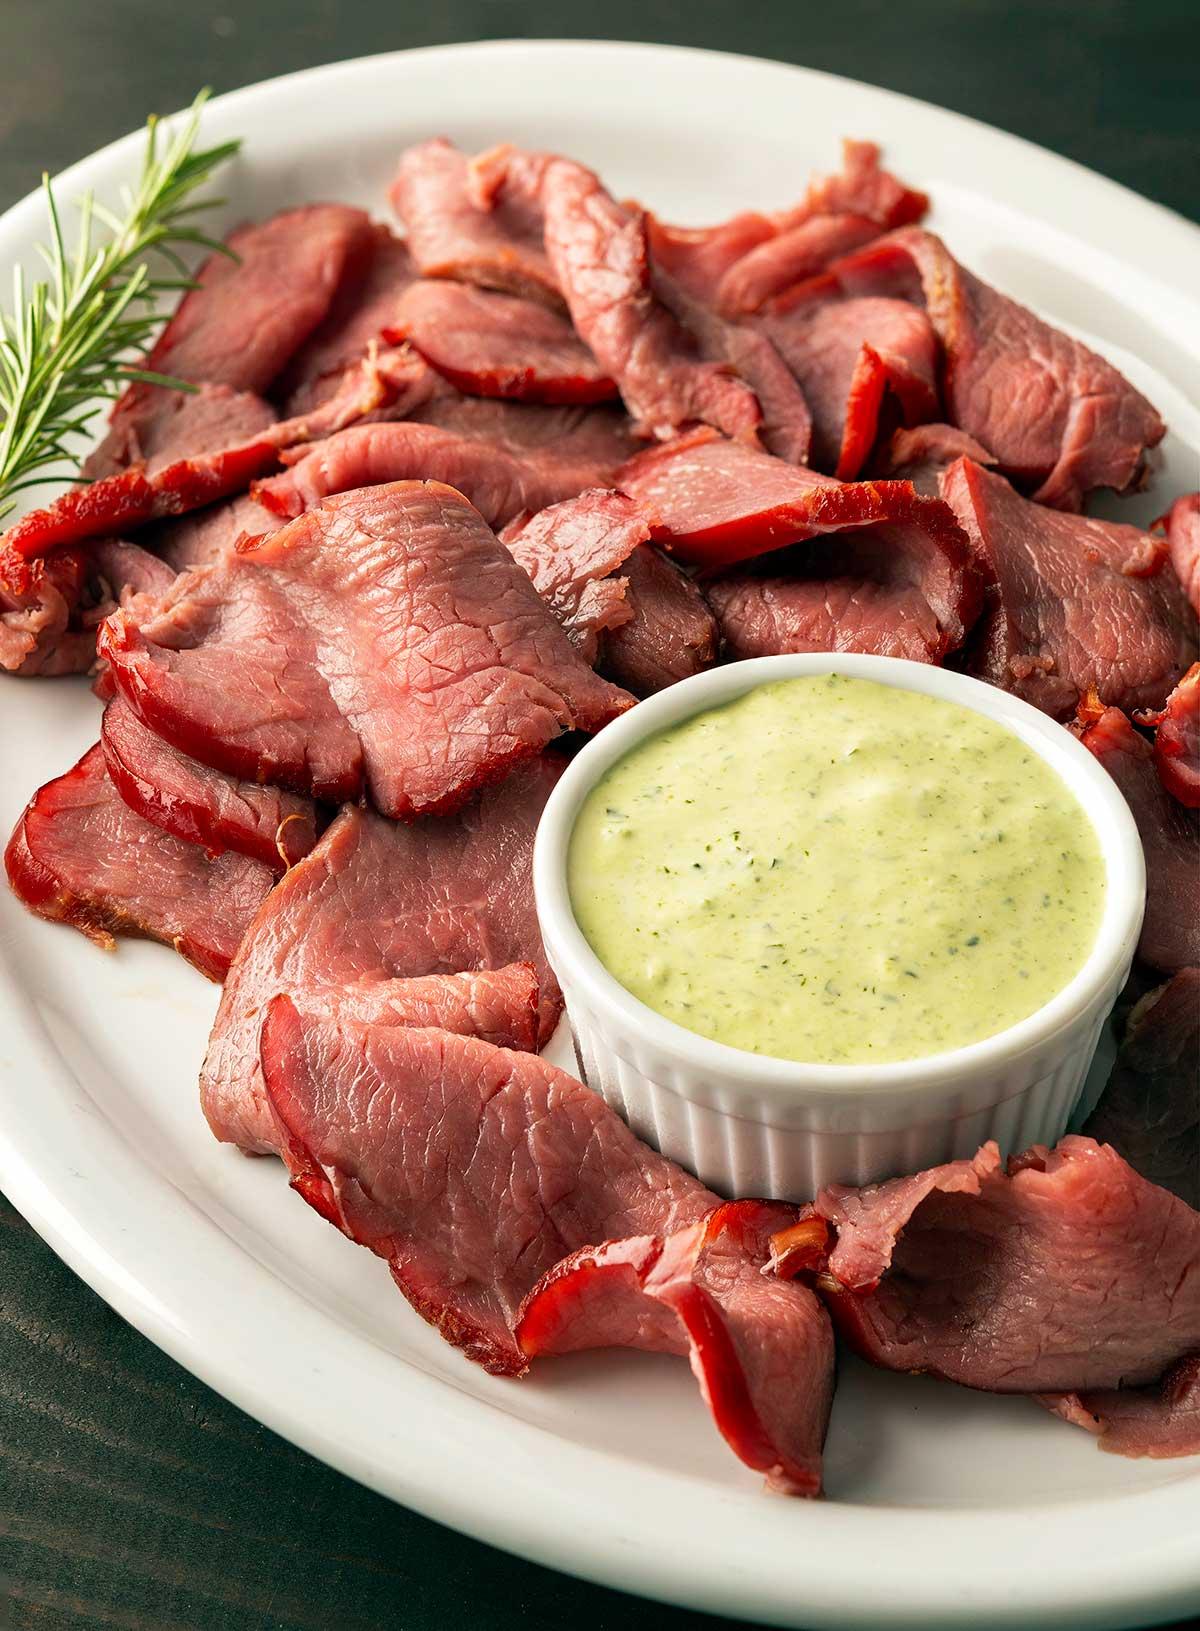 Closeup of sliced, smoked venison backstrap on a platter